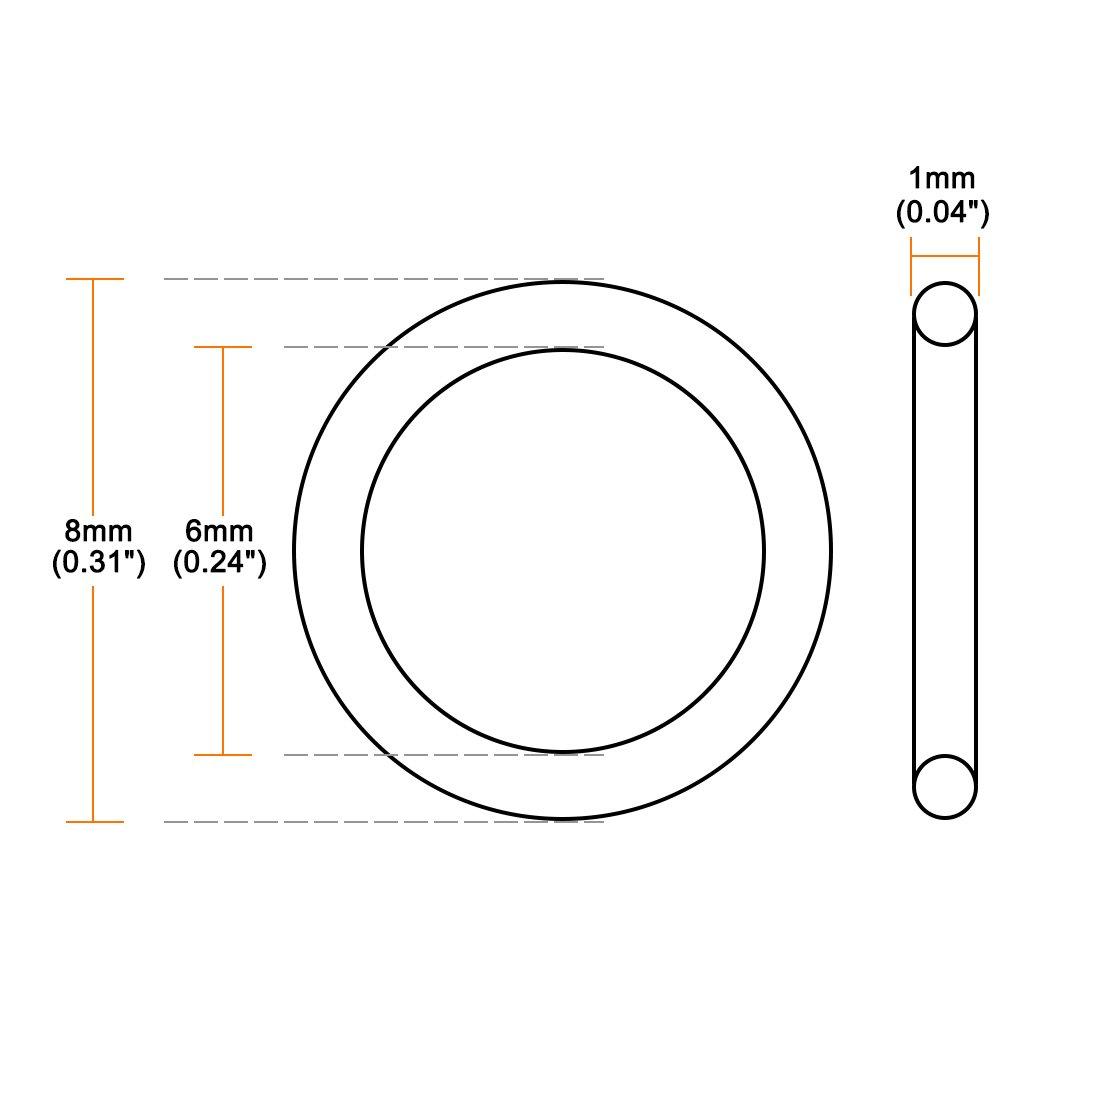 sourcing map 20pcs O-Rings Nitrilkautschuk Gummi 11mm x 13mm x 1mm Dichtungsringe Dichtung DE